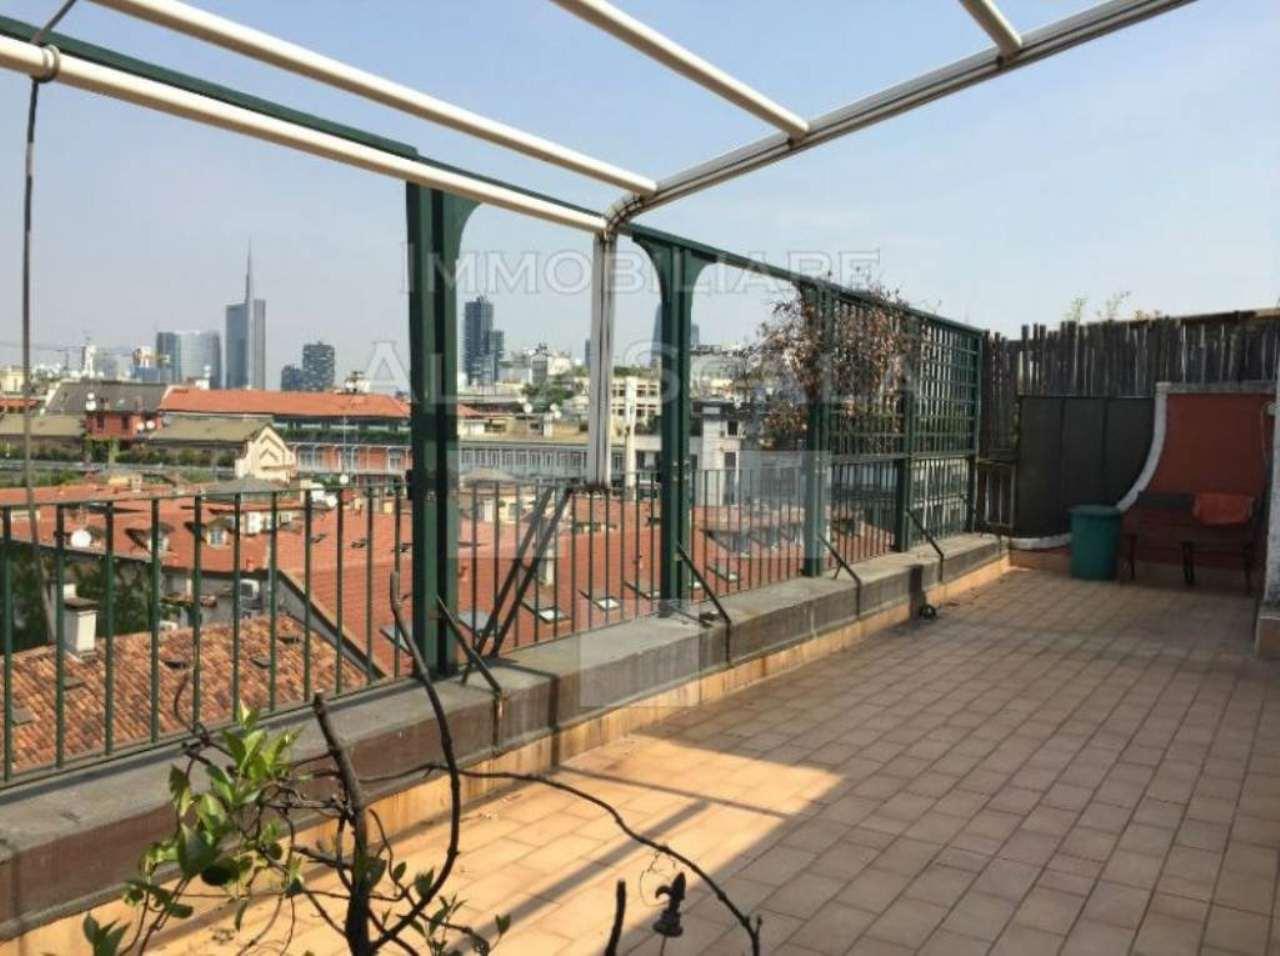 Stunning Case Vendita Milano Terrazzo Gallery - Modern Home Design ...